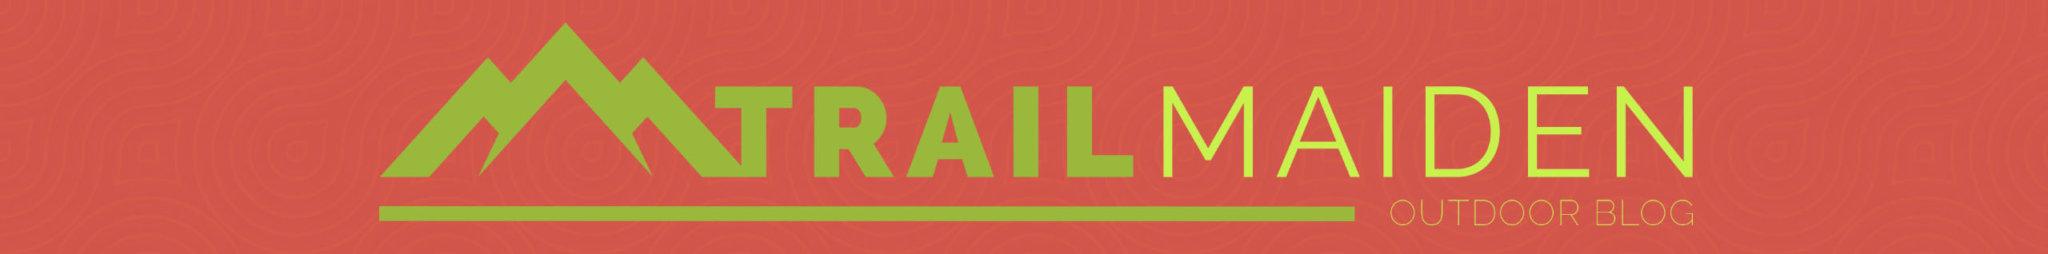 trailmaiden.com logo